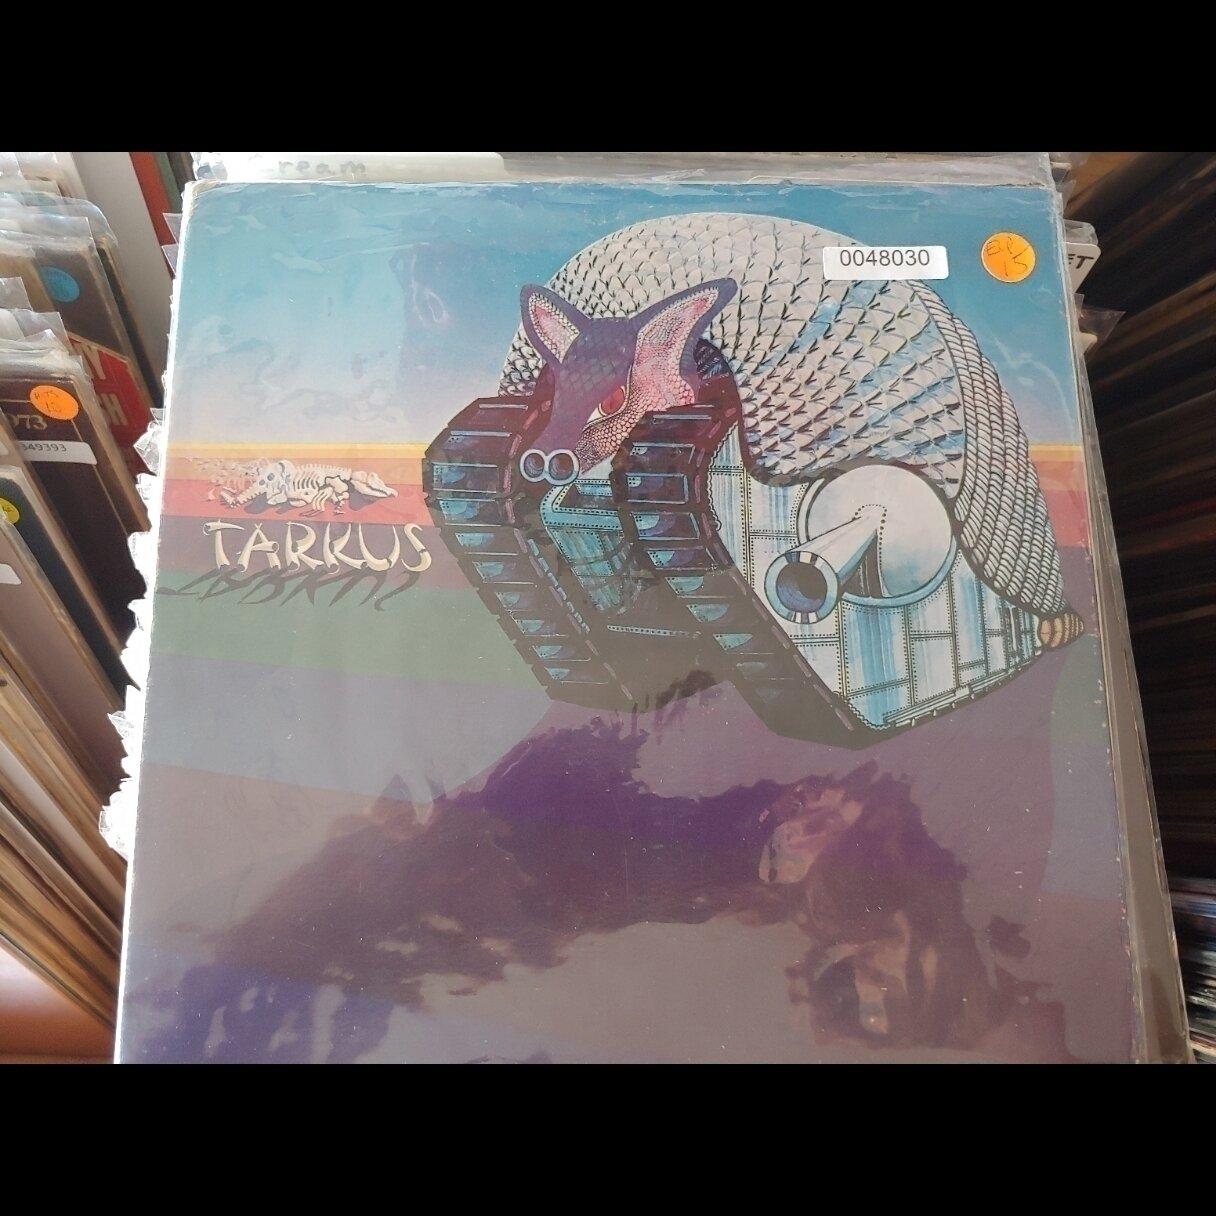 Emerson Lake and Palmer tarkus